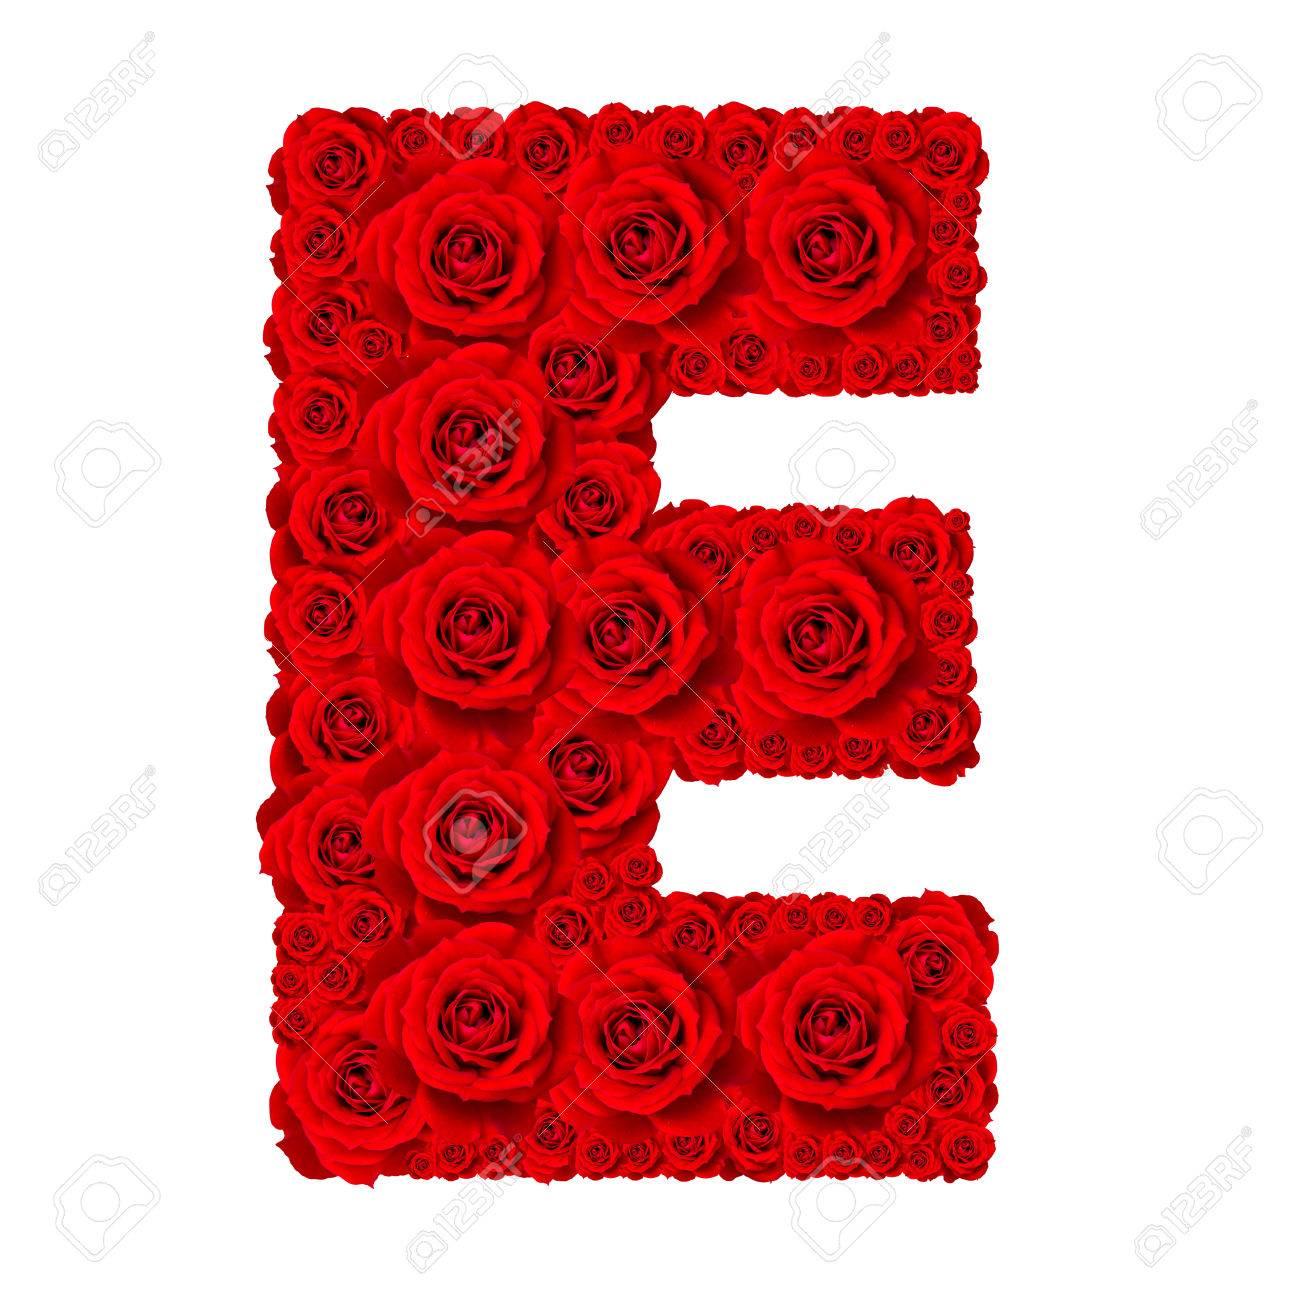 Rose alphabet set alphabet capital letter e made from red rose rose alphabet set alphabet capital letter e made from red rose blossoms isolated on white altavistaventures Images